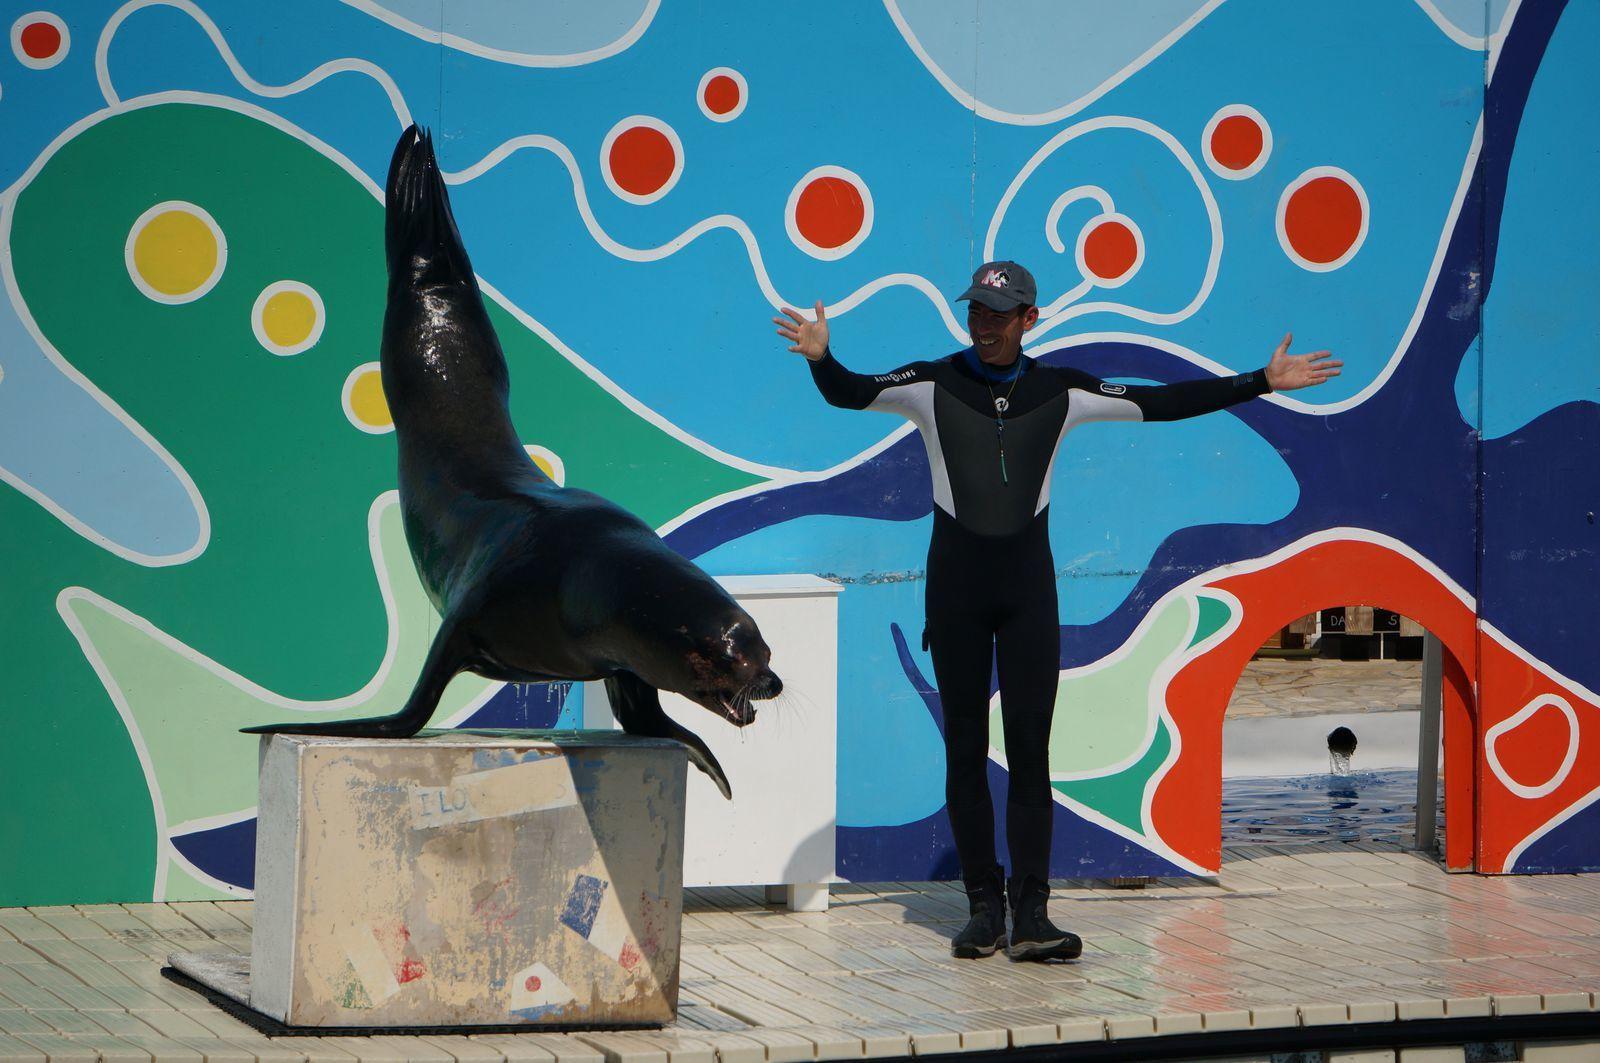 Mardi 10 juin - Antibes - Marineland